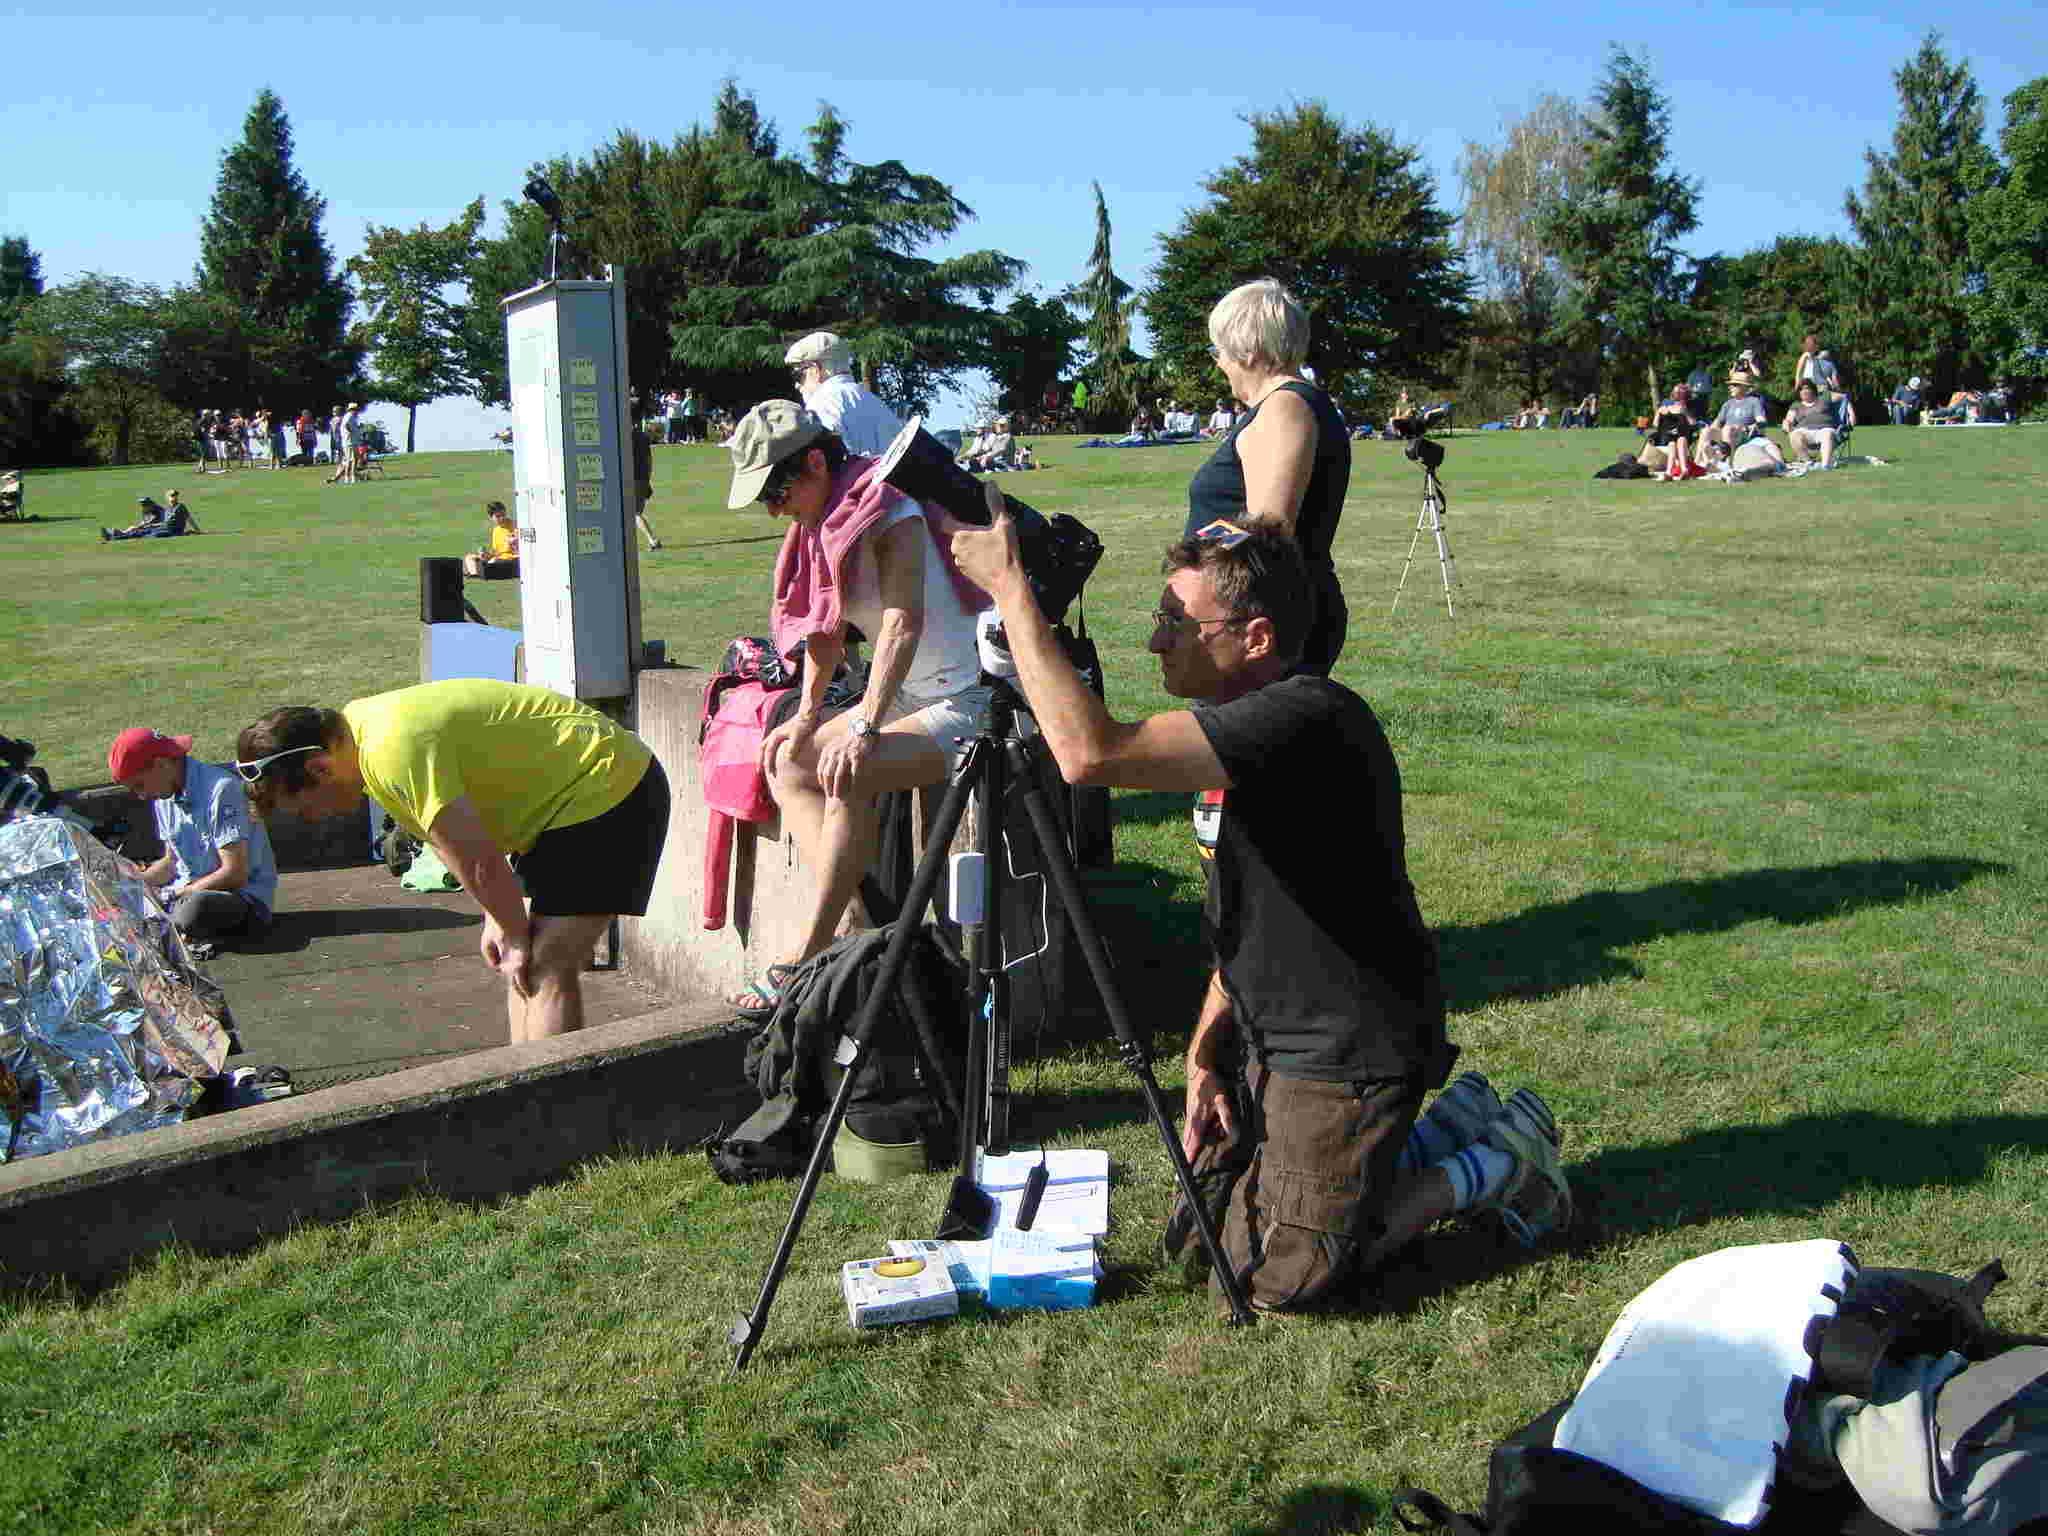 21 August 2017 - Oregon Albany - Solar Eclipse Dsc04313